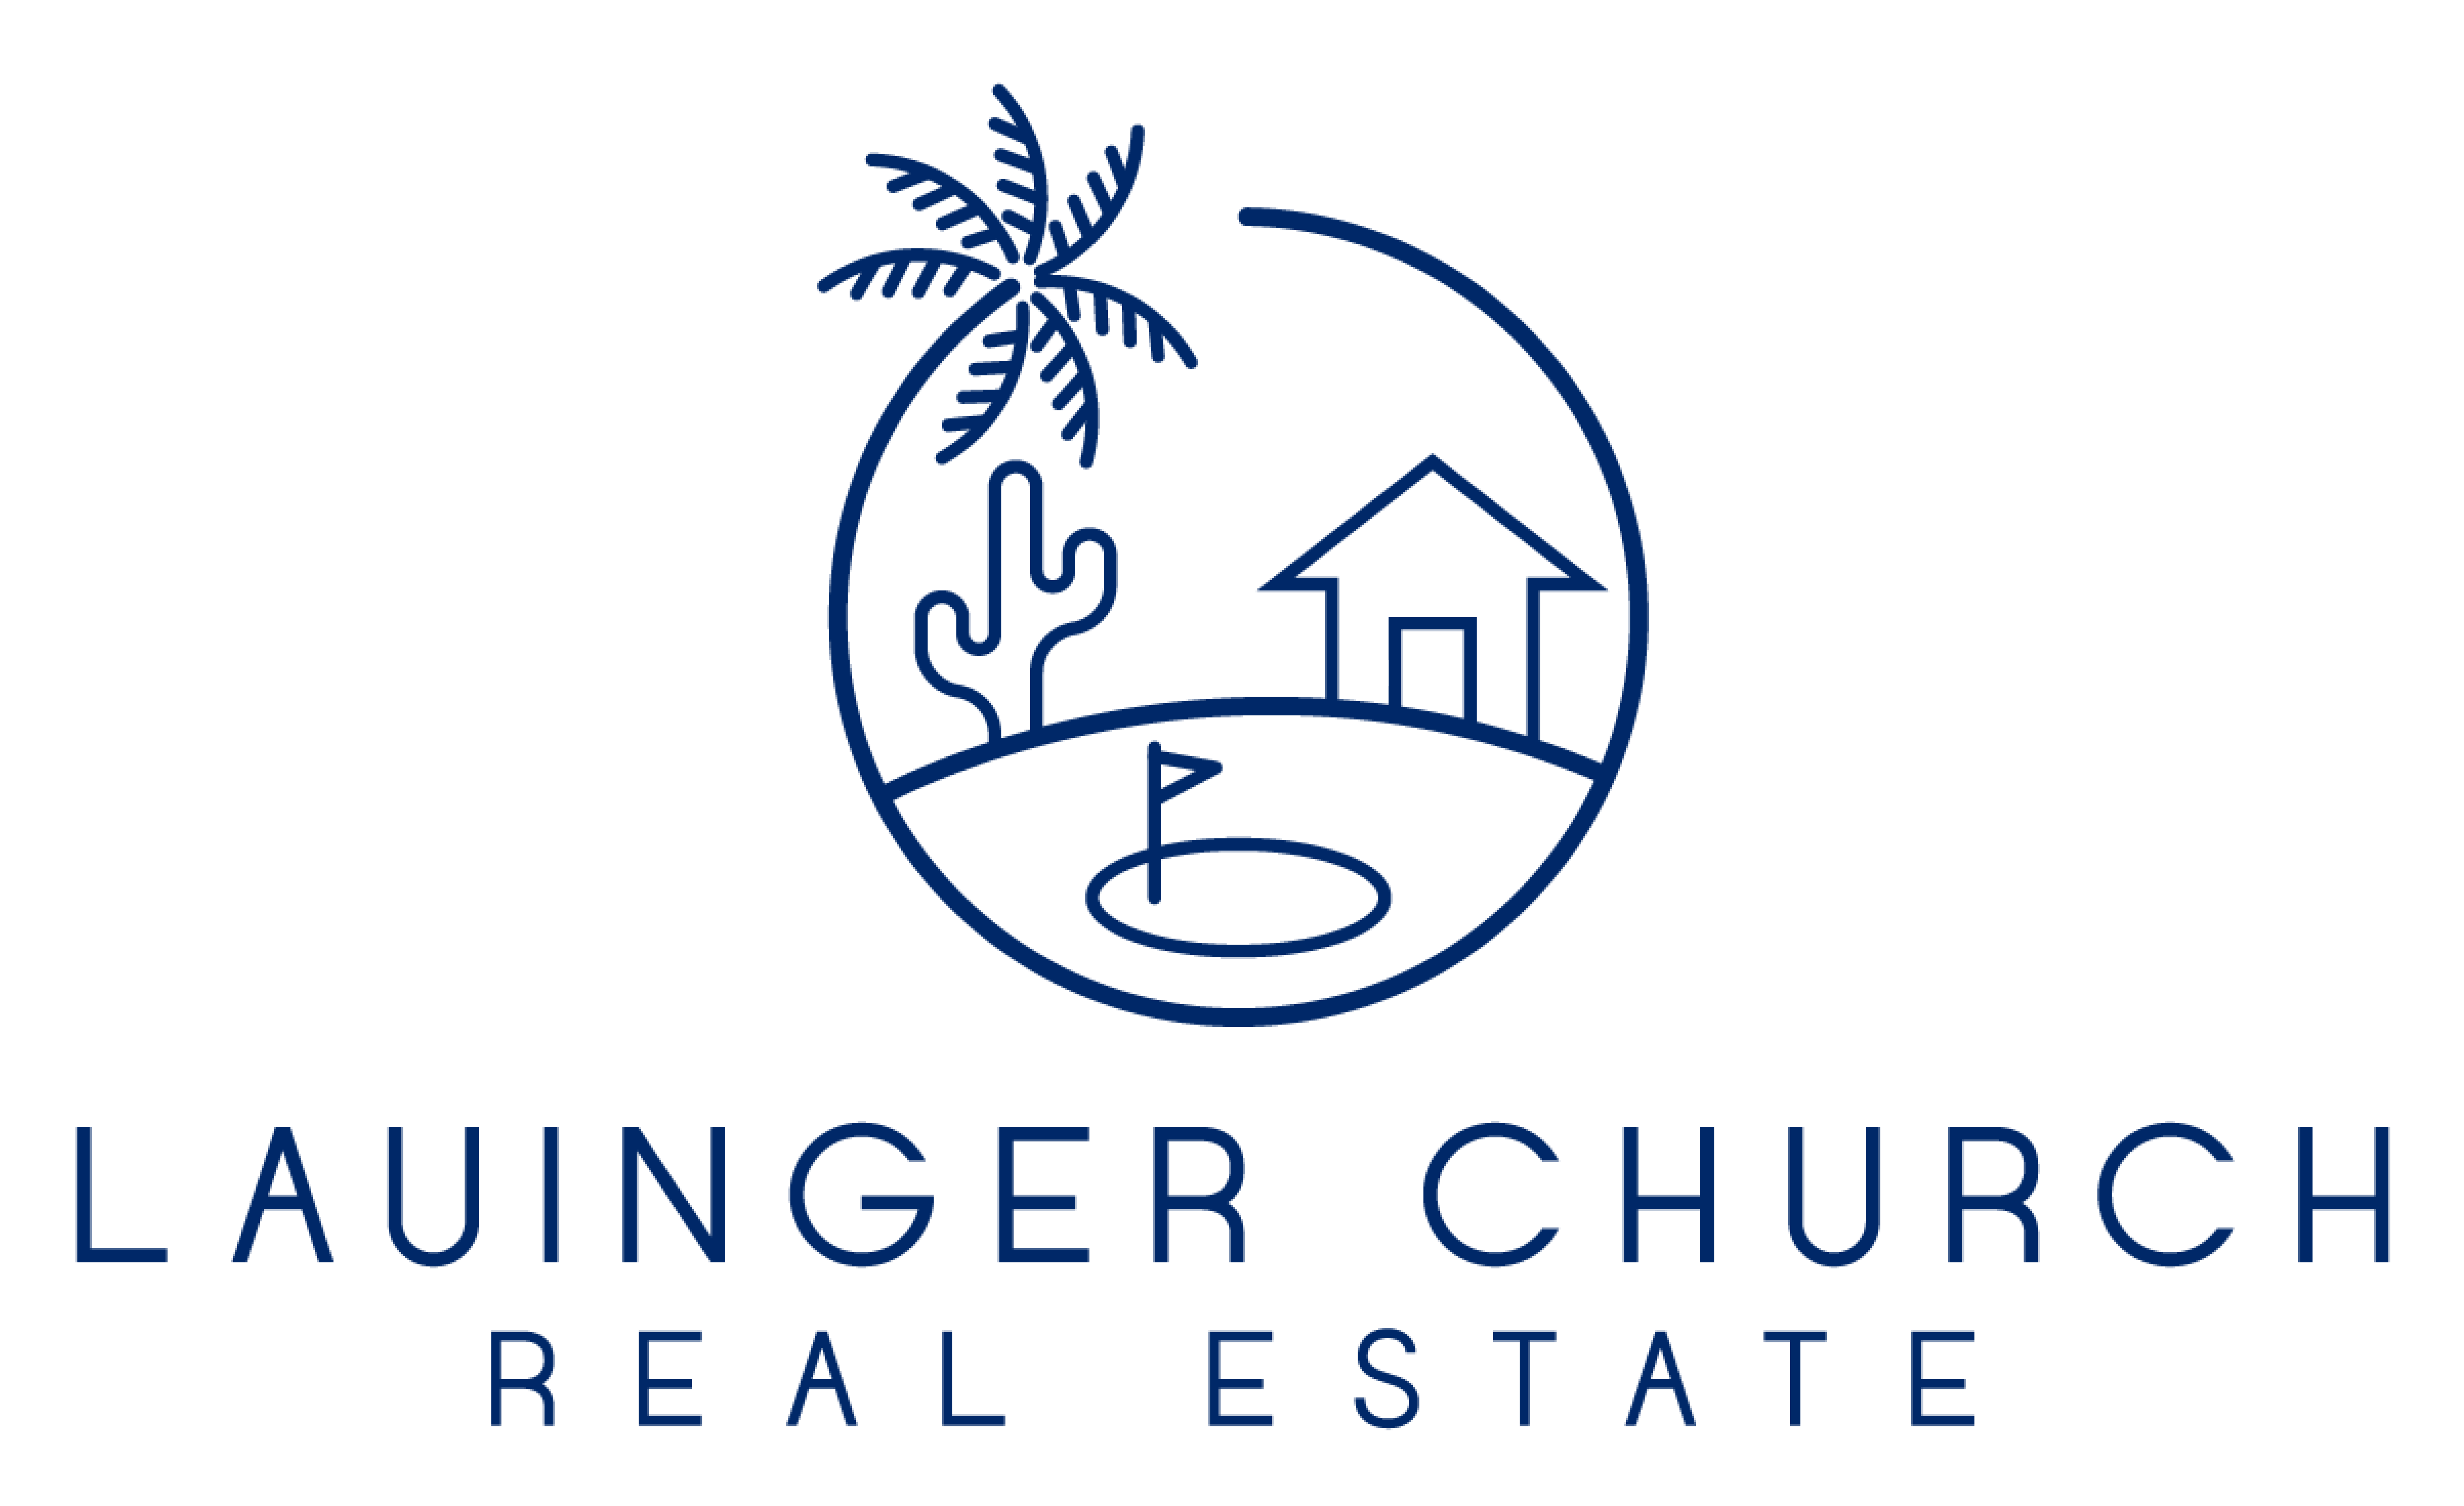 Lauinger Church Real Estate